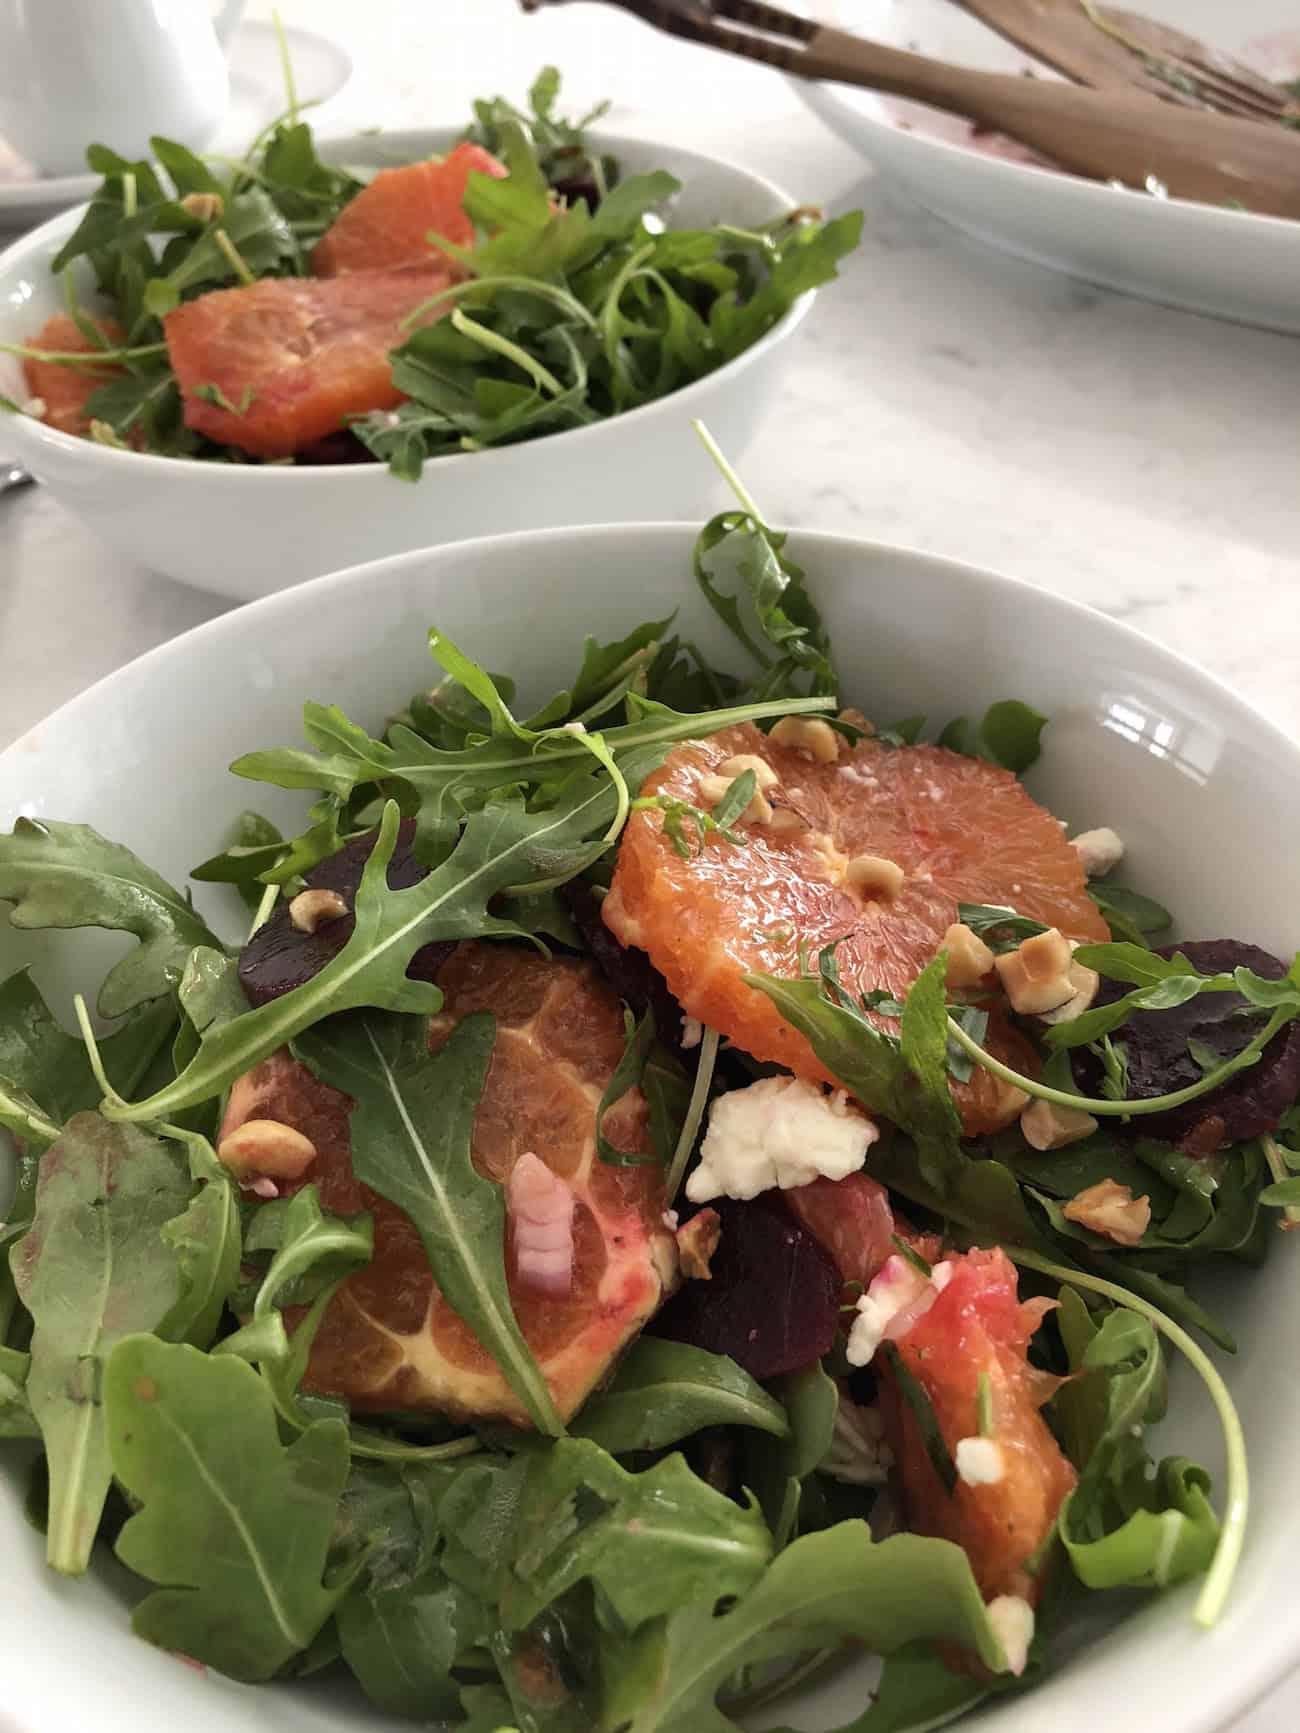 Blood Orange and Beet Salad with Hazelnut Citrus Vinaigrette in two bowls